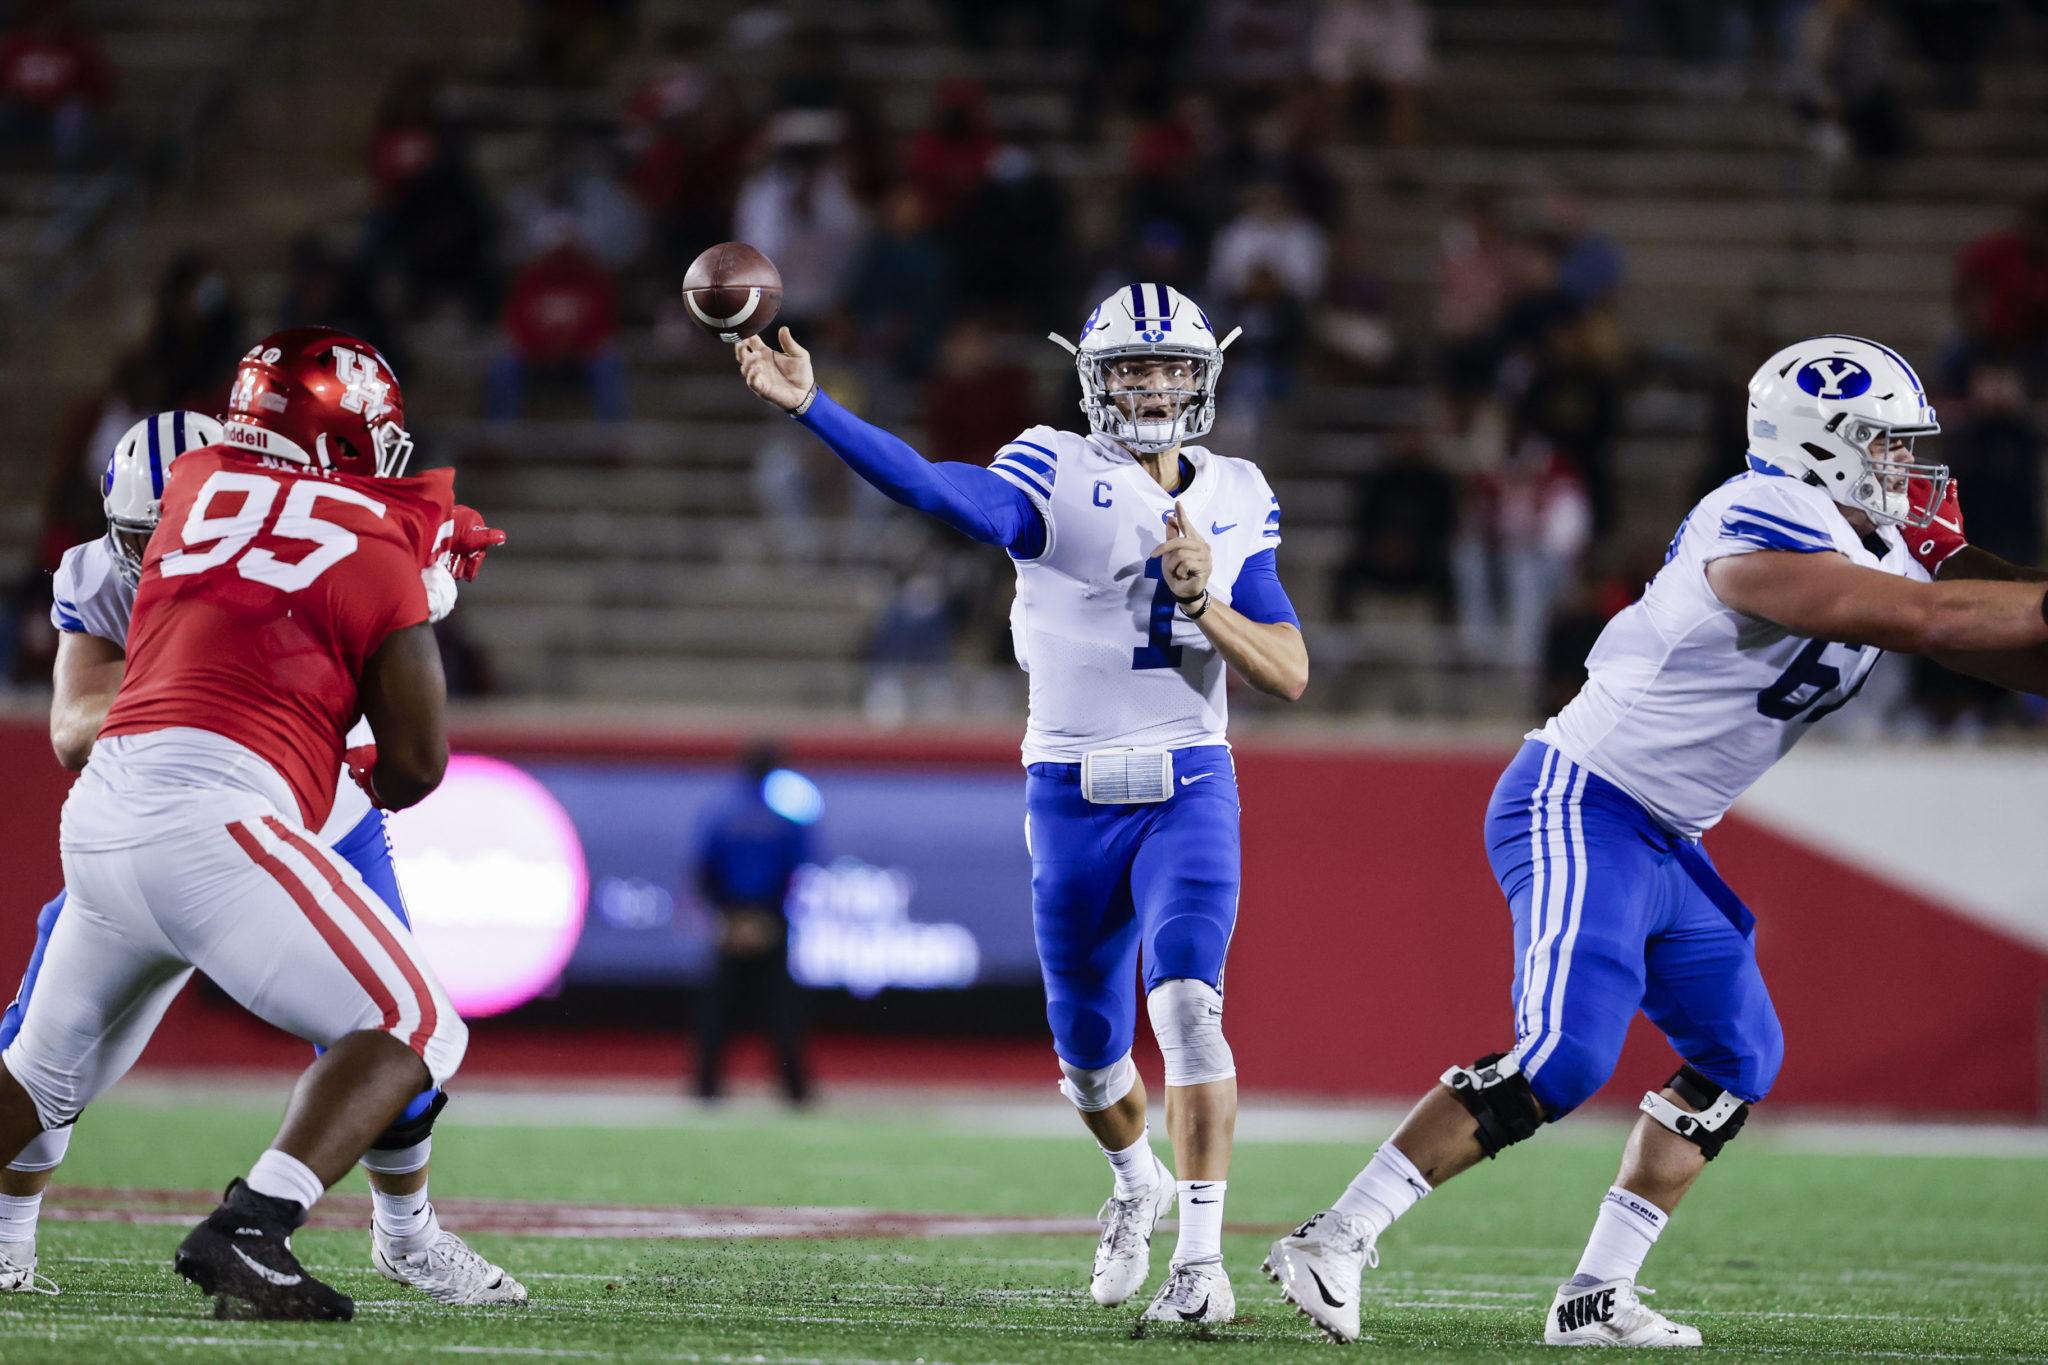 Milestones, win streak on the line as BYU faces Western Kentucky